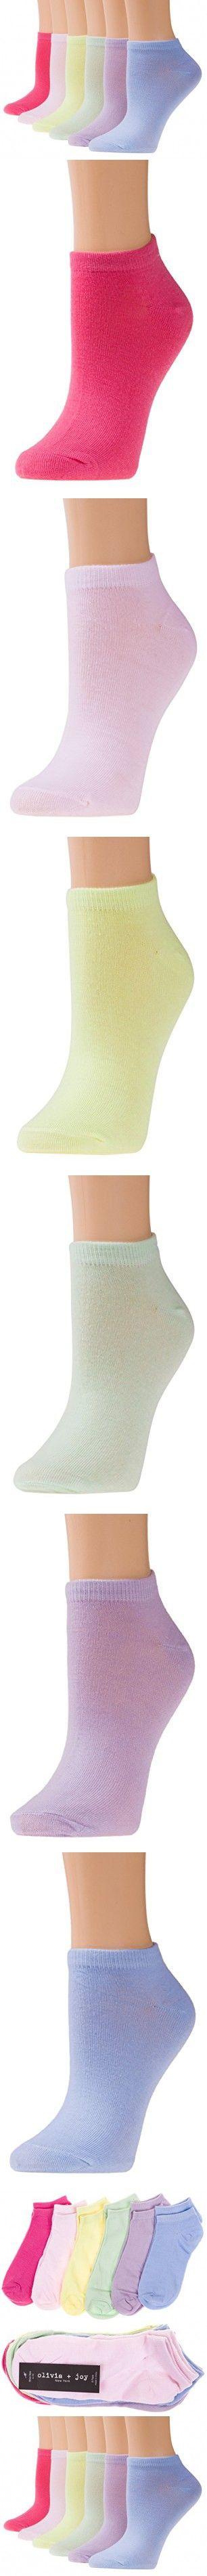 Olivia & Joy Womens Low Cut Fitness Workout Athletic Socks 6PK Pink Medium